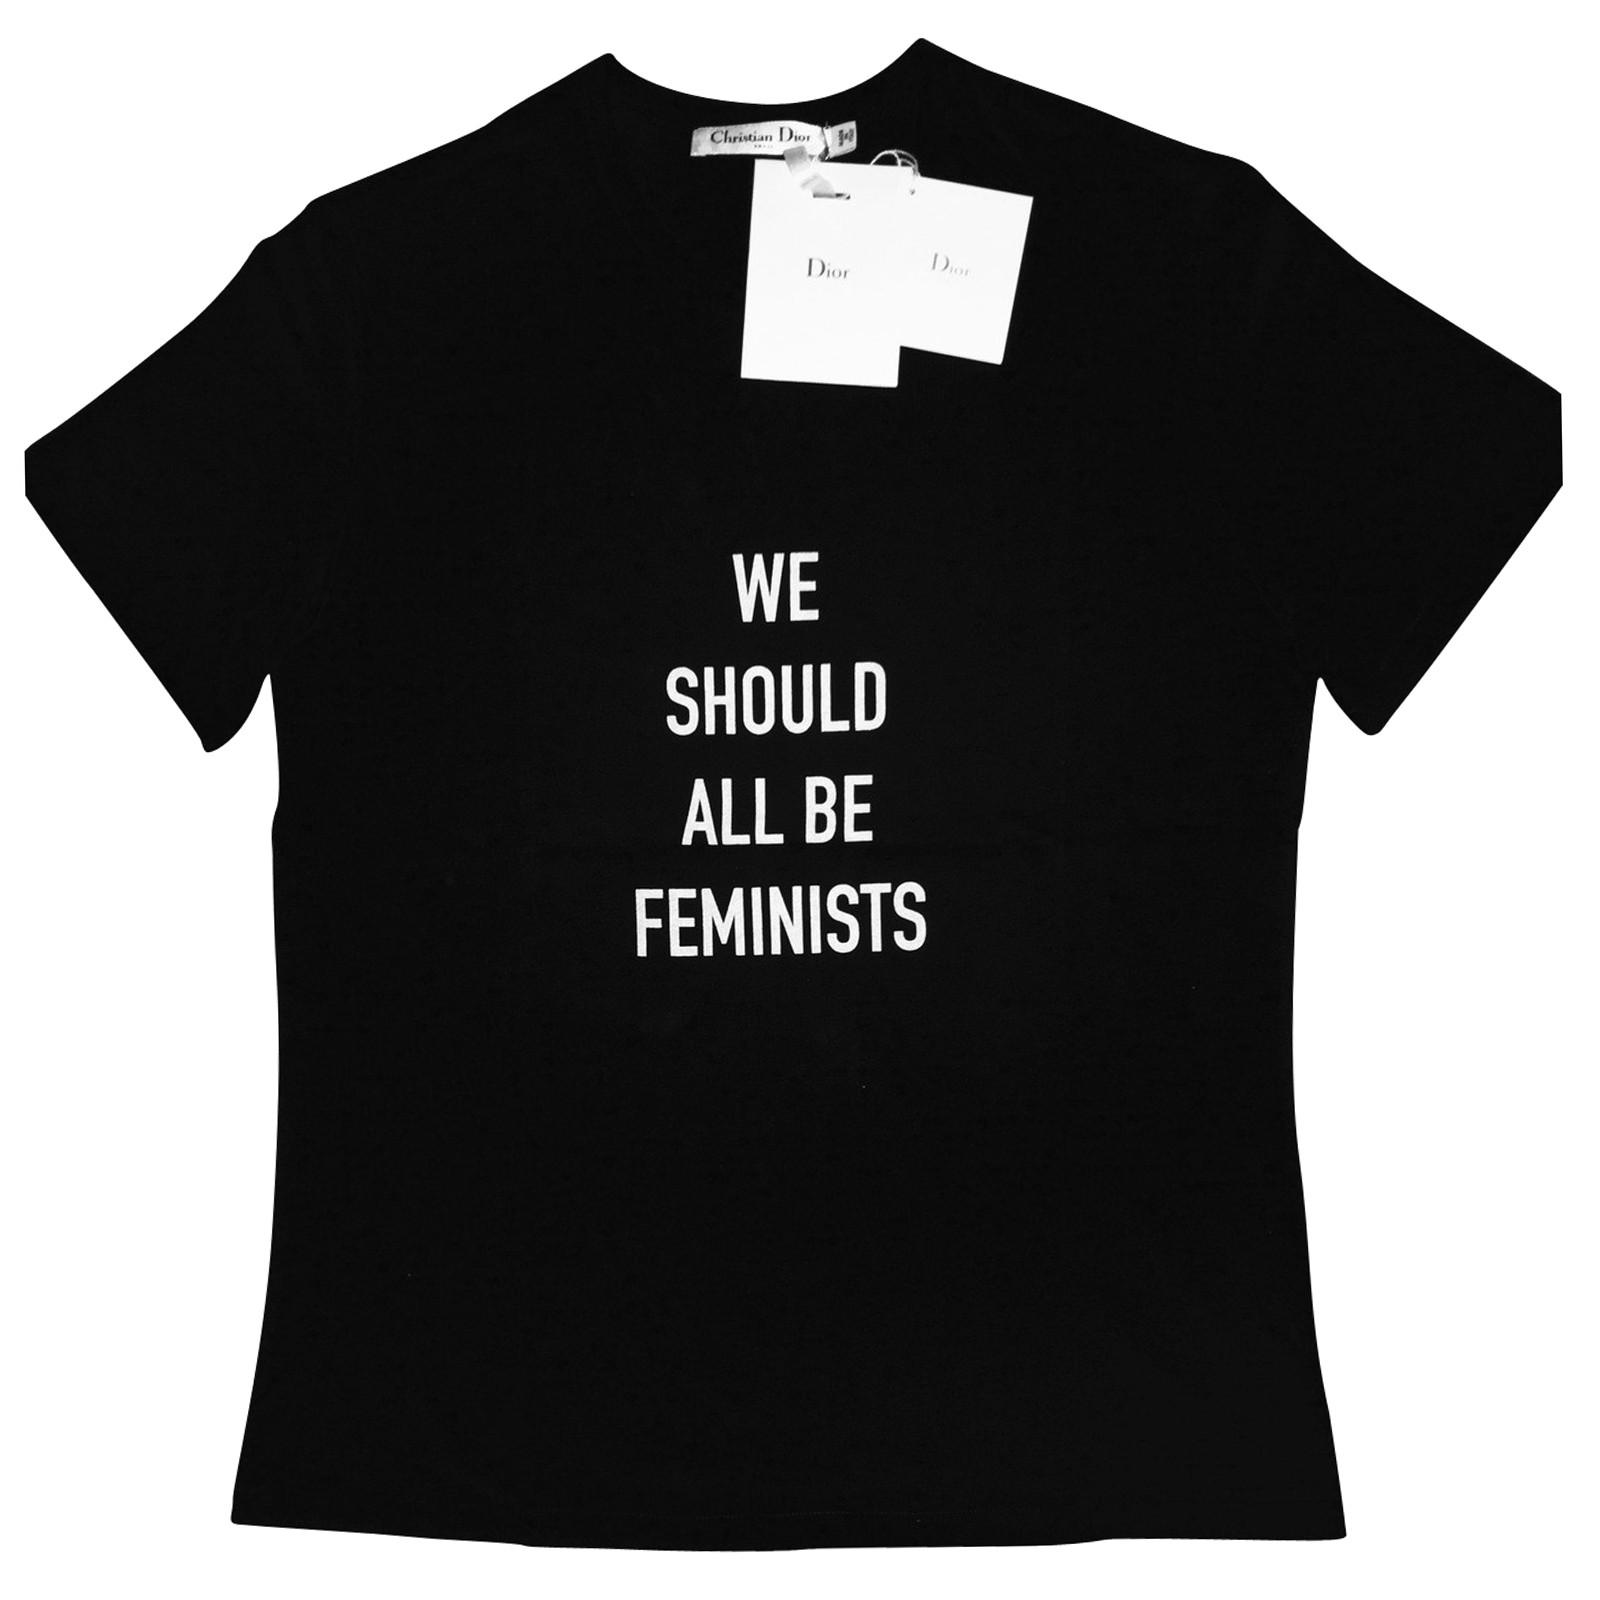 christian dior t-shirt - second hand christian dior t-shirt